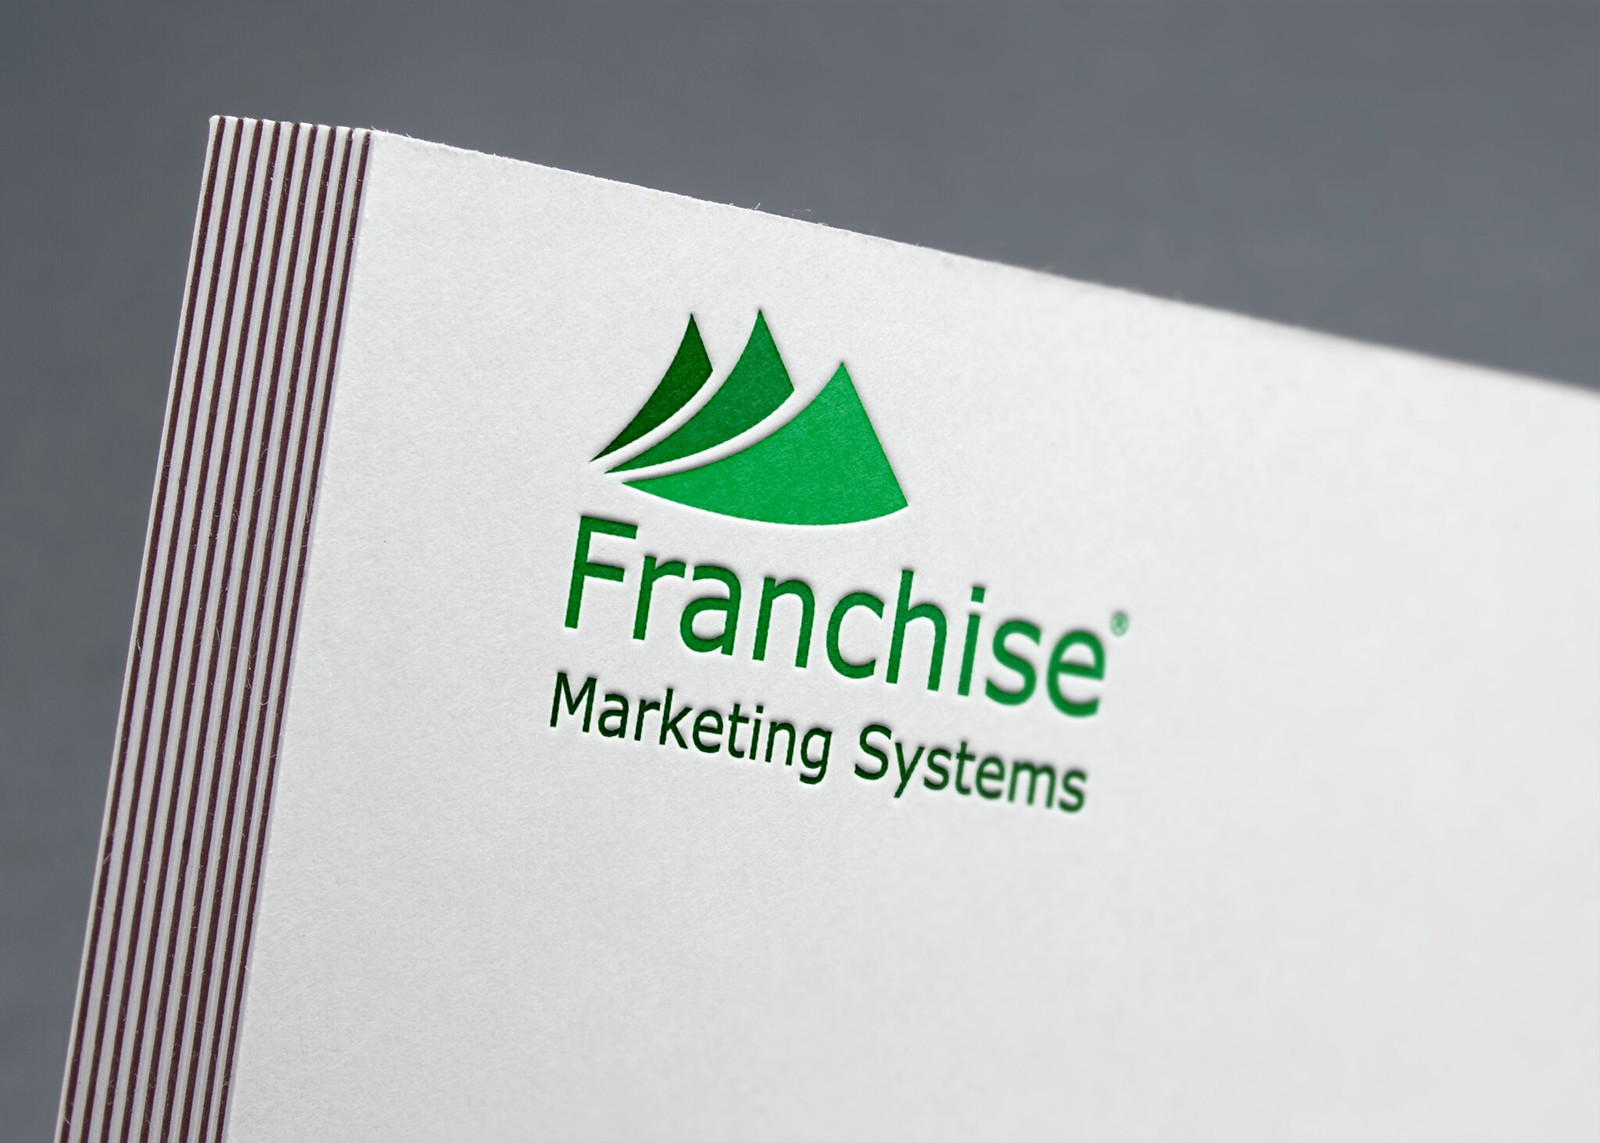 Franchise Marketing Systems FMS Tuyen Chau Marketing Director